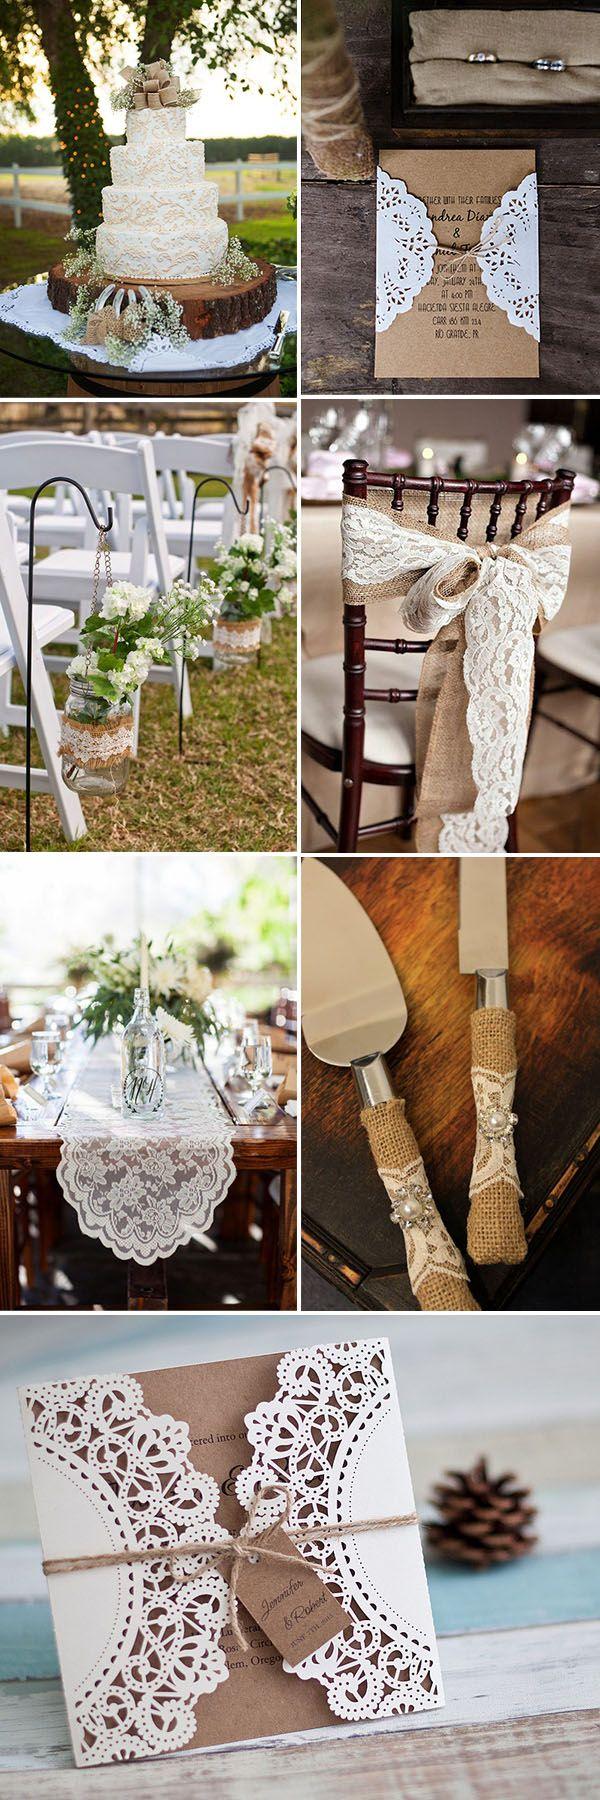 6 Awesome Vintage Wedding Theme Ideas to Inspire You | Vintage wedding  theme, Wedding themes, Vintage wedding centerpieces